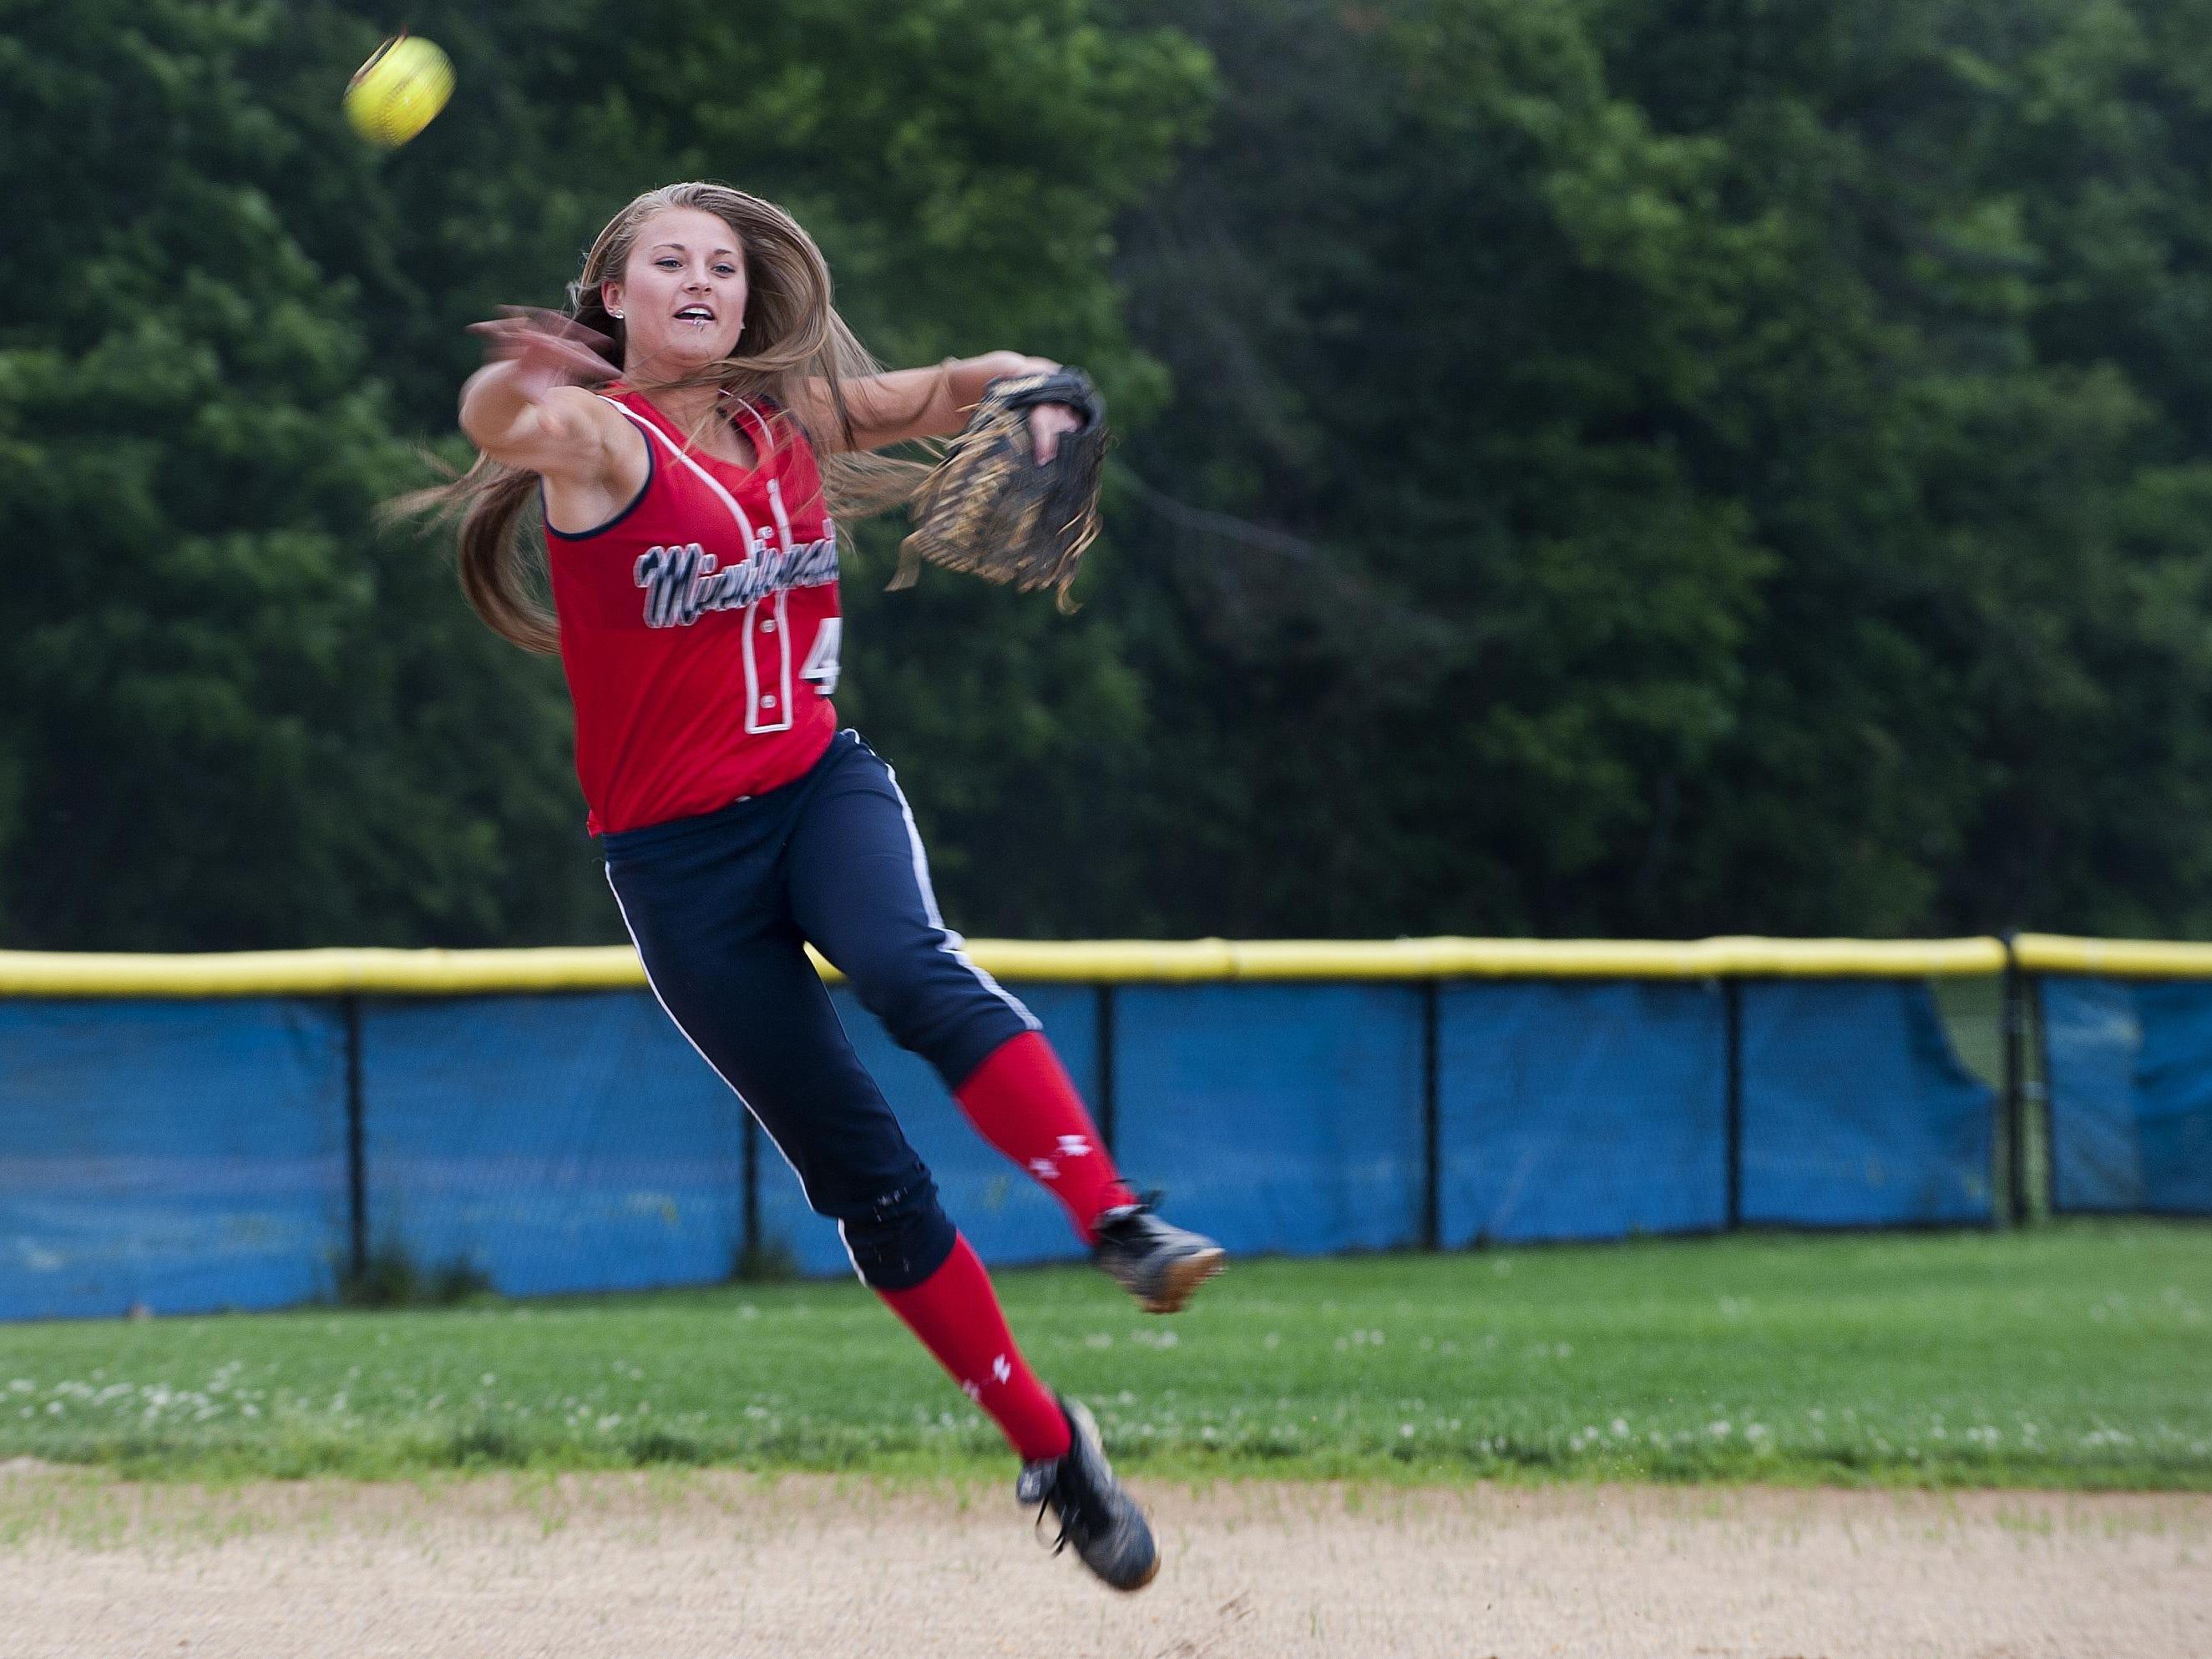 Washington Township shortstop Jess Hughes was named to the CBS MaxPreps All-American Team on Thursday. She will play at Fordham University next season.